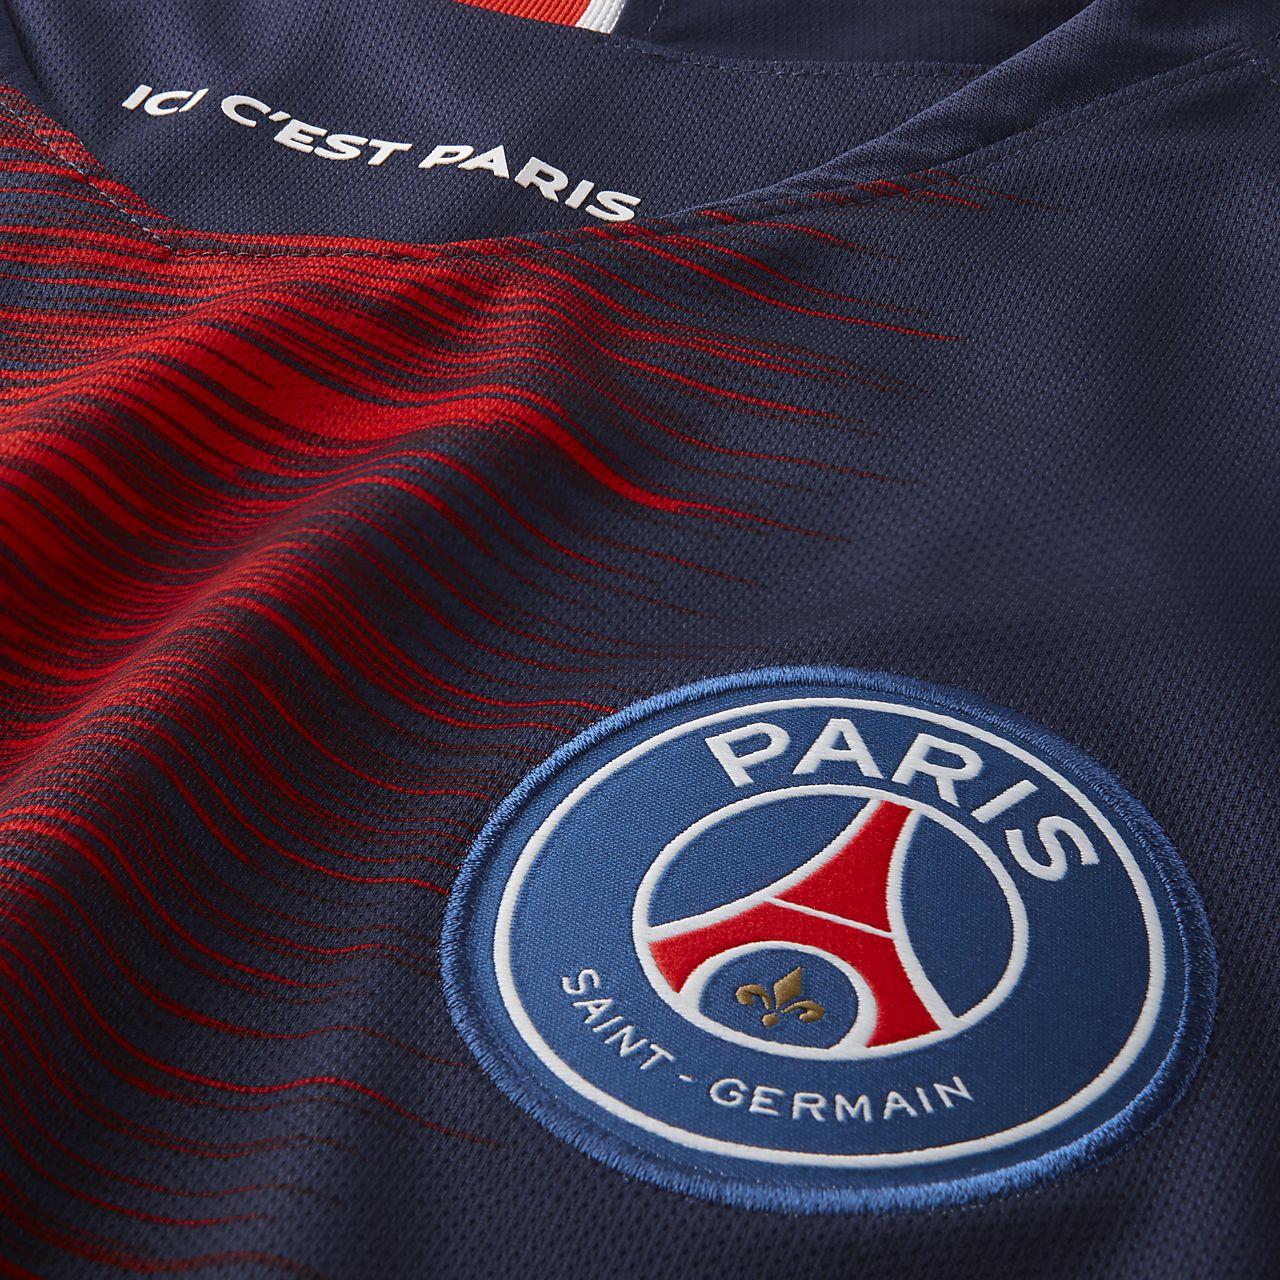 d6fc6f866b9 2018 19 Paris Saint-Germain Stadium Home Men s Football Shirt. Nike ...